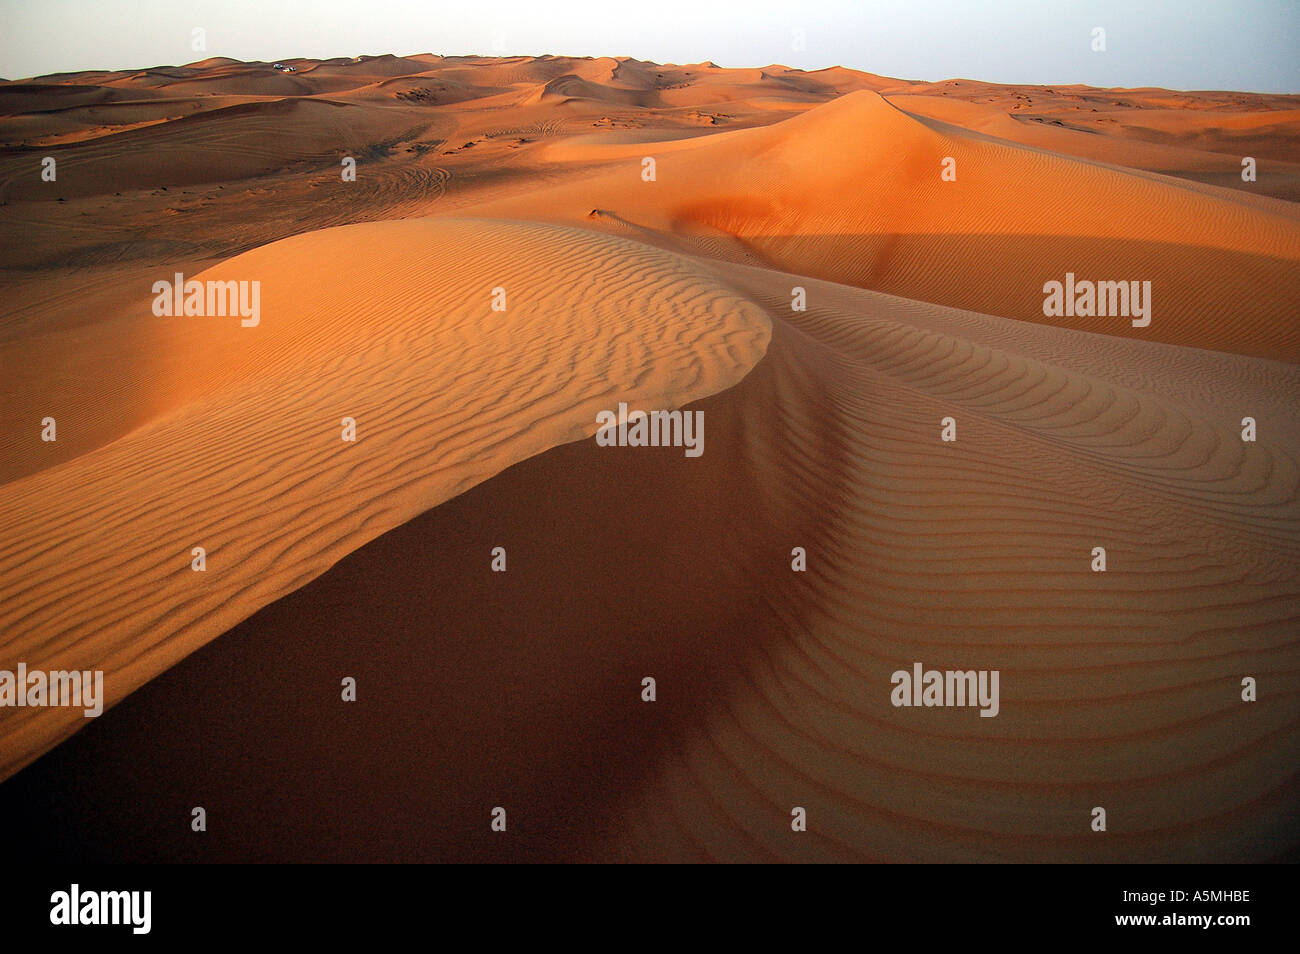 Waves of desert sand golden brown in colour natural Dubai